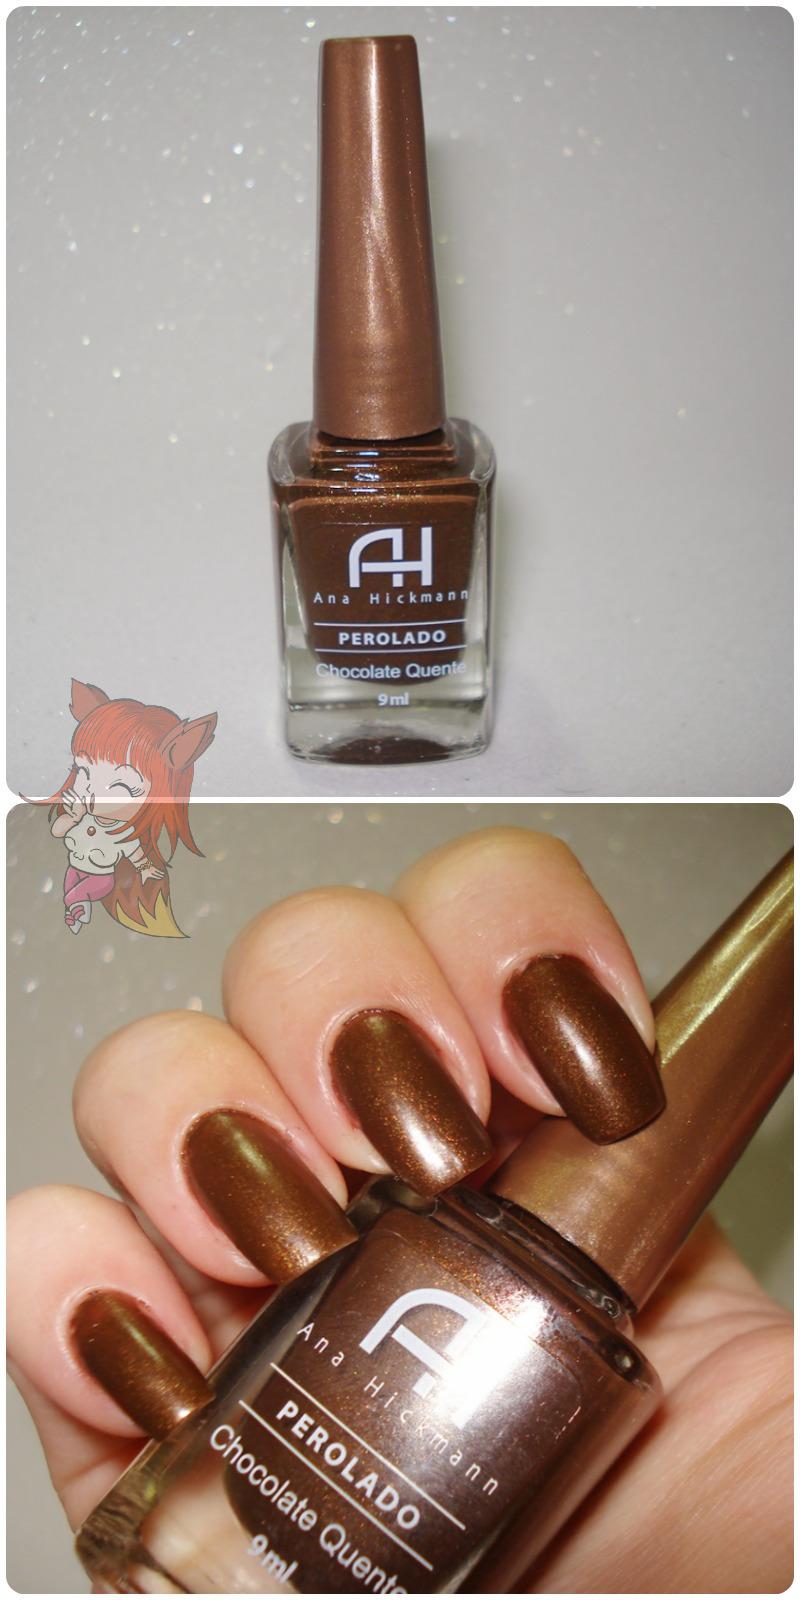 Esmalte Ana Hickmann :: Chocolate Quente - Resenha